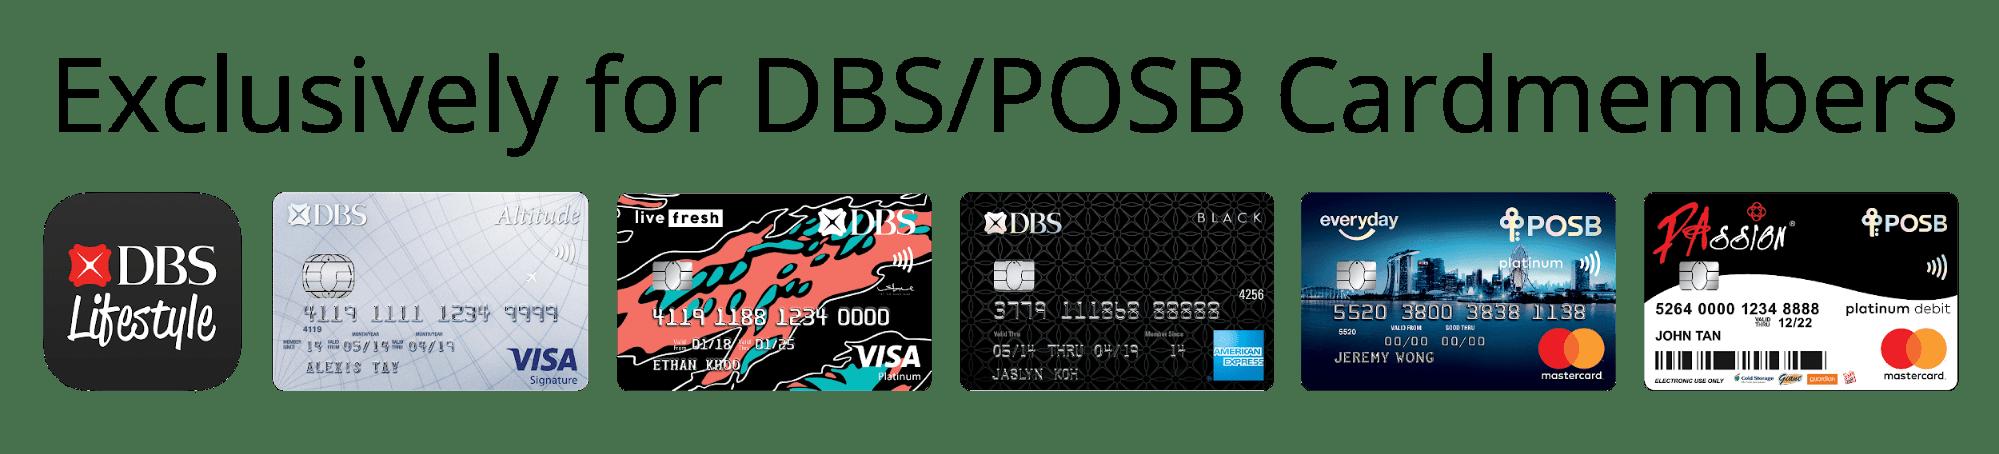 dbs/posb cards